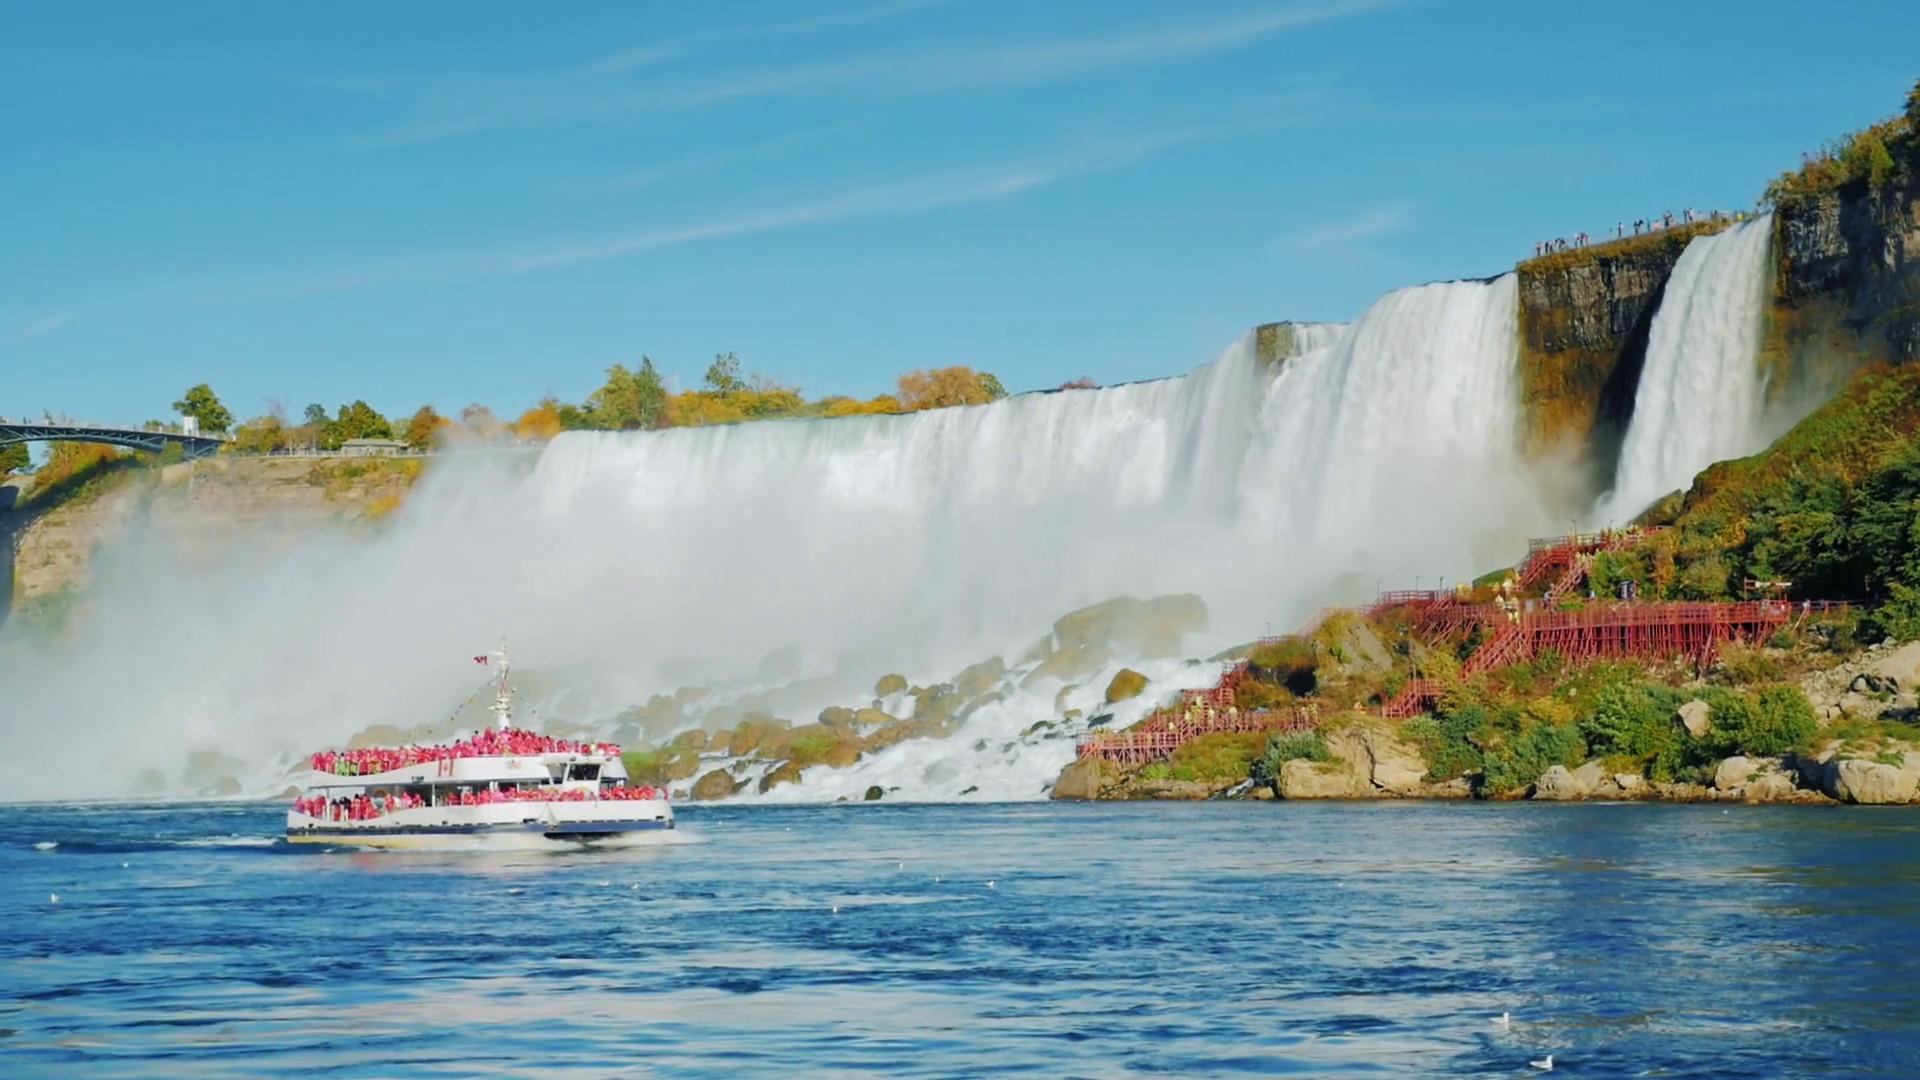 Niagara Falls Wallpaper 1920x1080 Niagara Falls Background 183 ① Wallpapertag